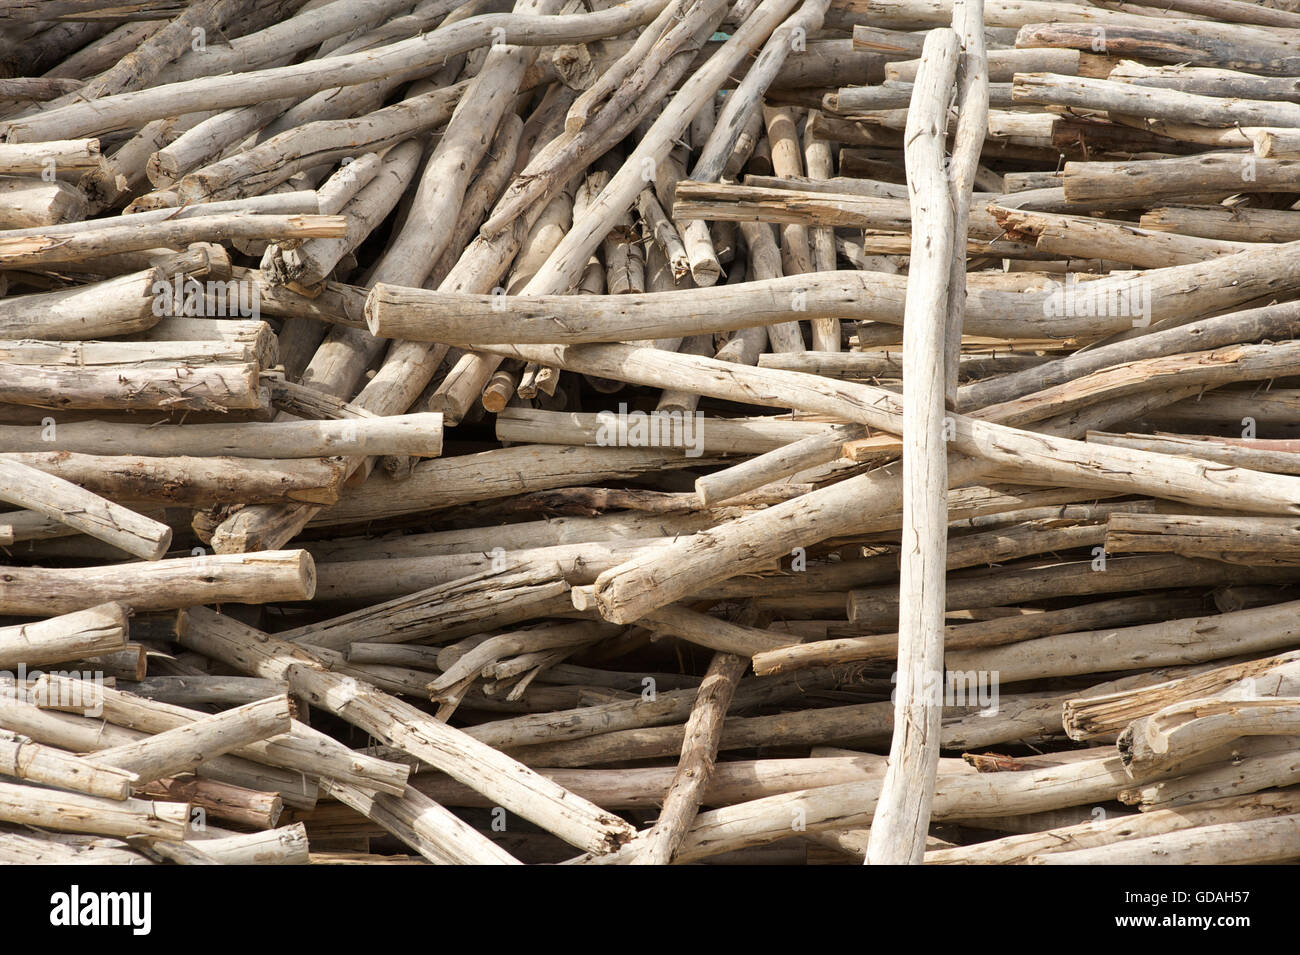 Stacks of wooden poles. Axum, Tigray, Ethiopia - Stock Image